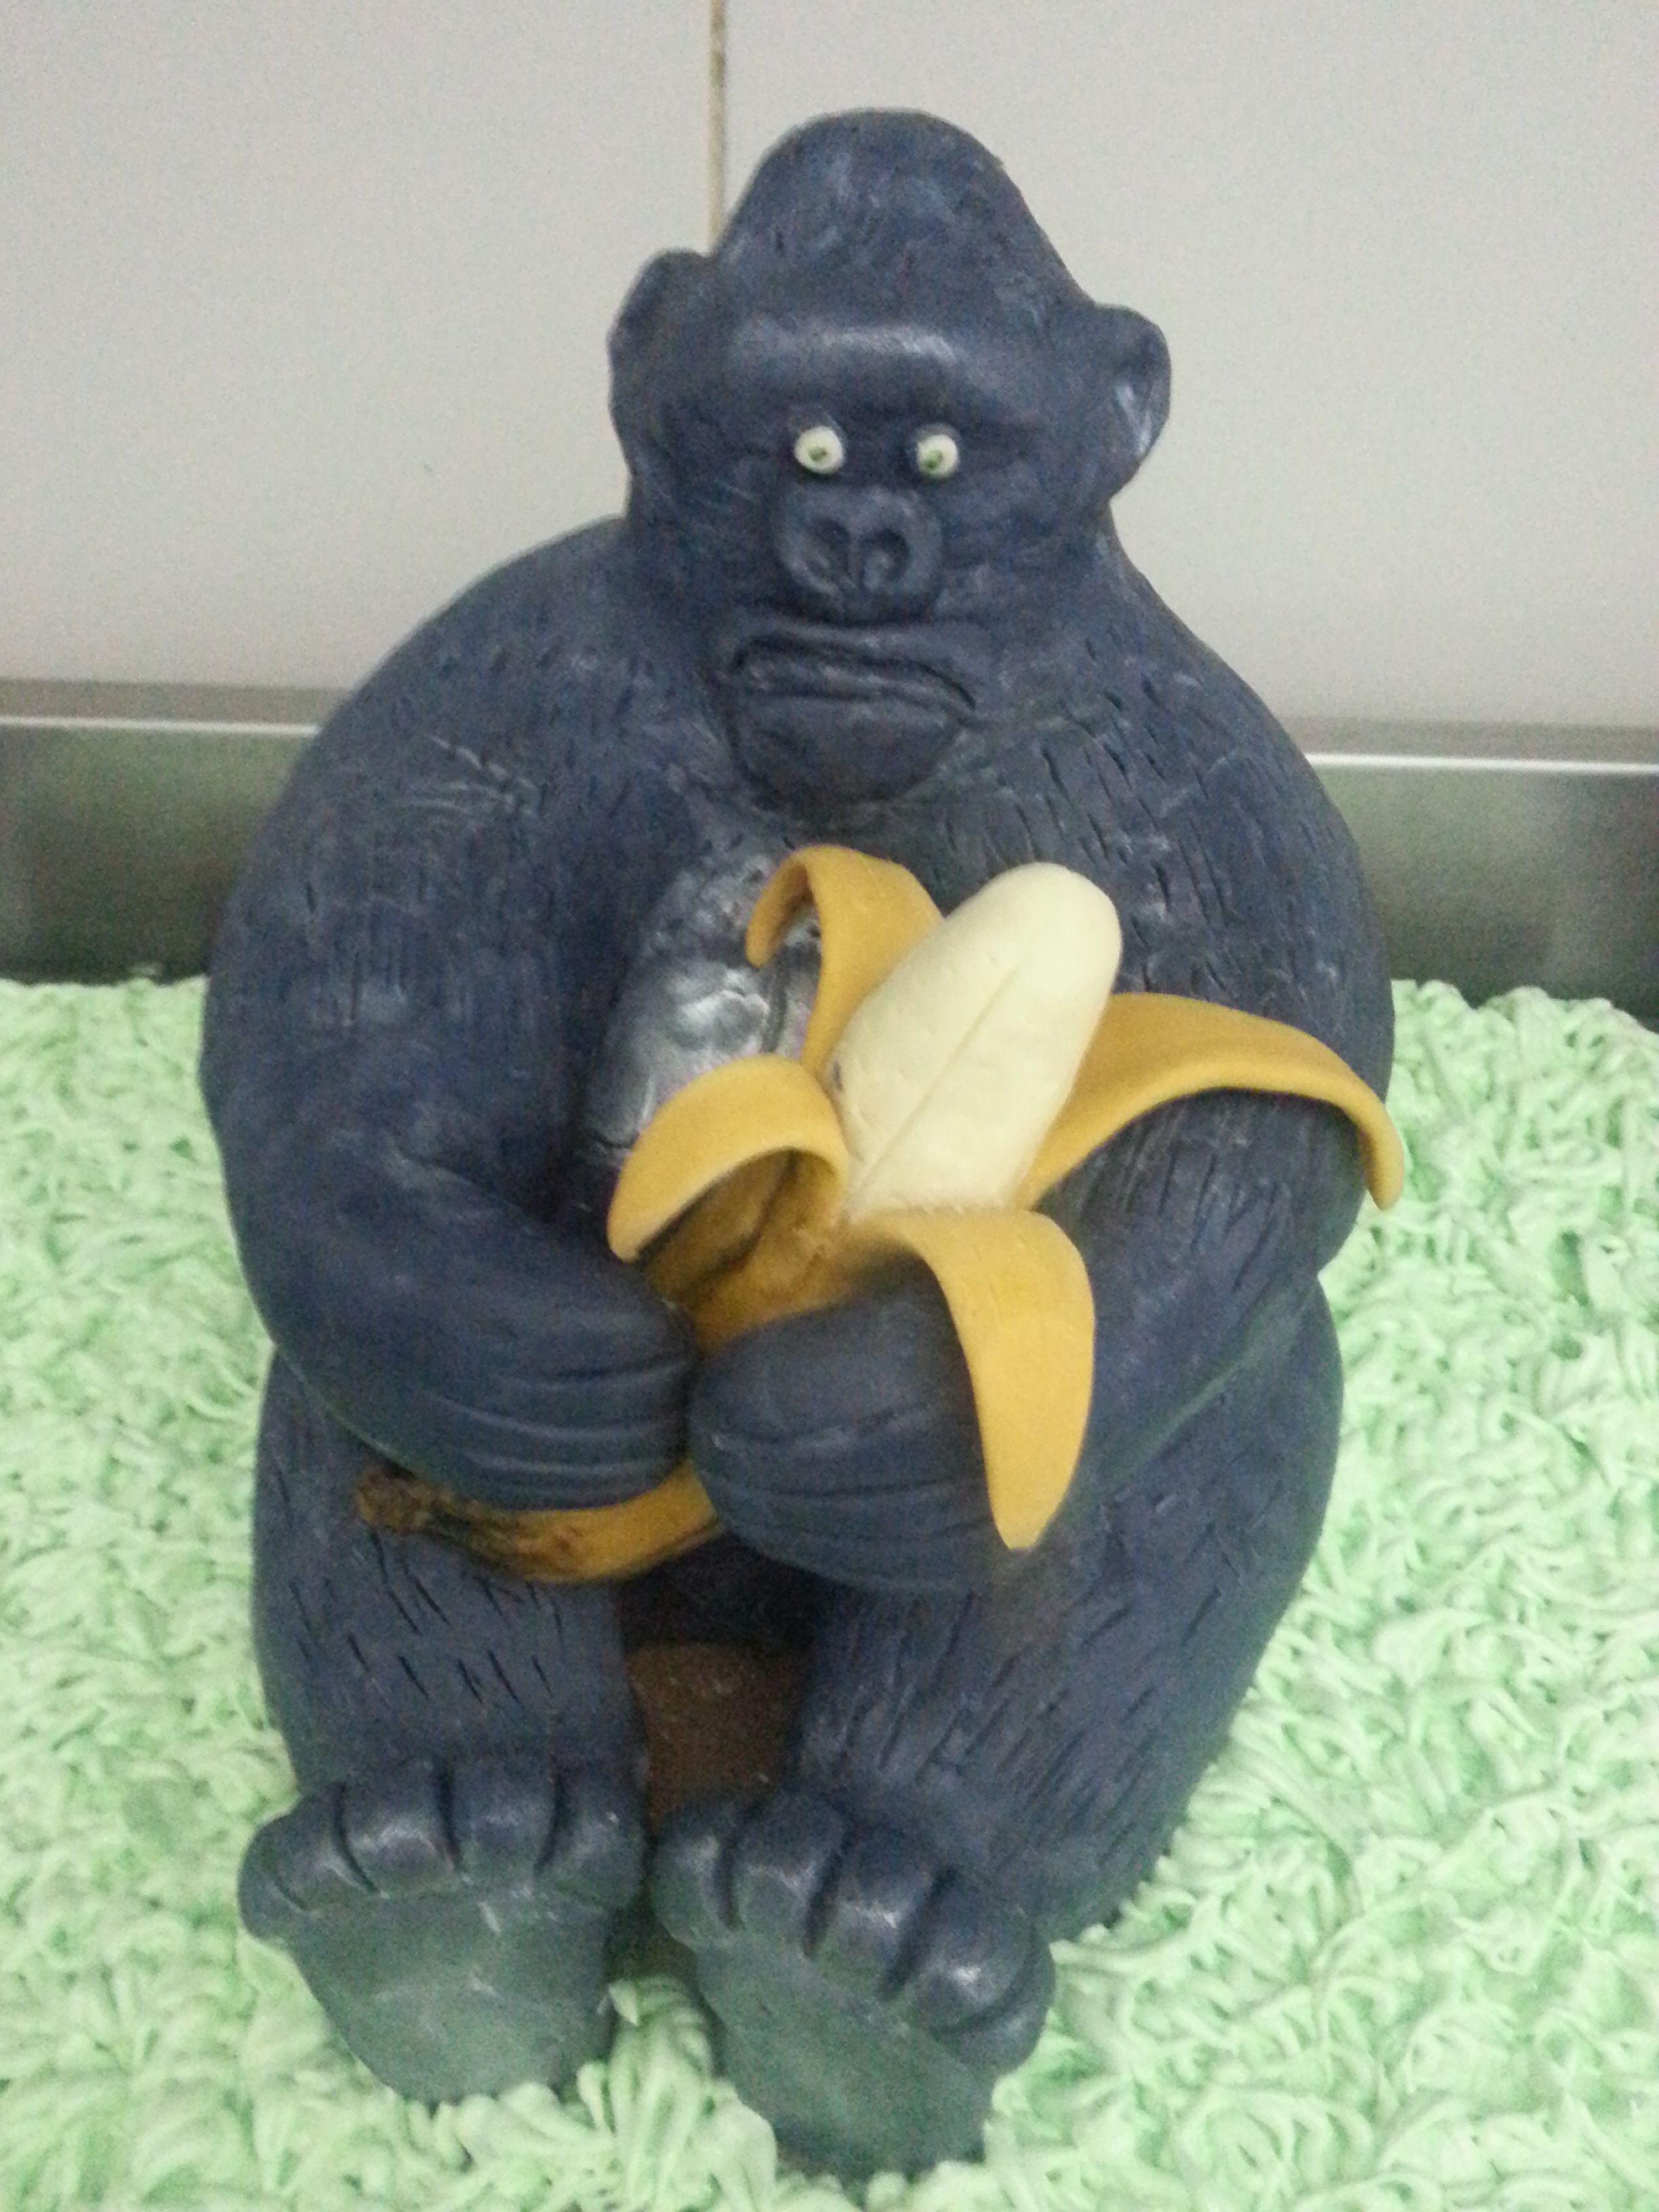 #Gorilla #Banana #Jungle #Cake #Fun #Funny #Tropical #Delicious #Custom #Cakes #Suite101 #Tribe